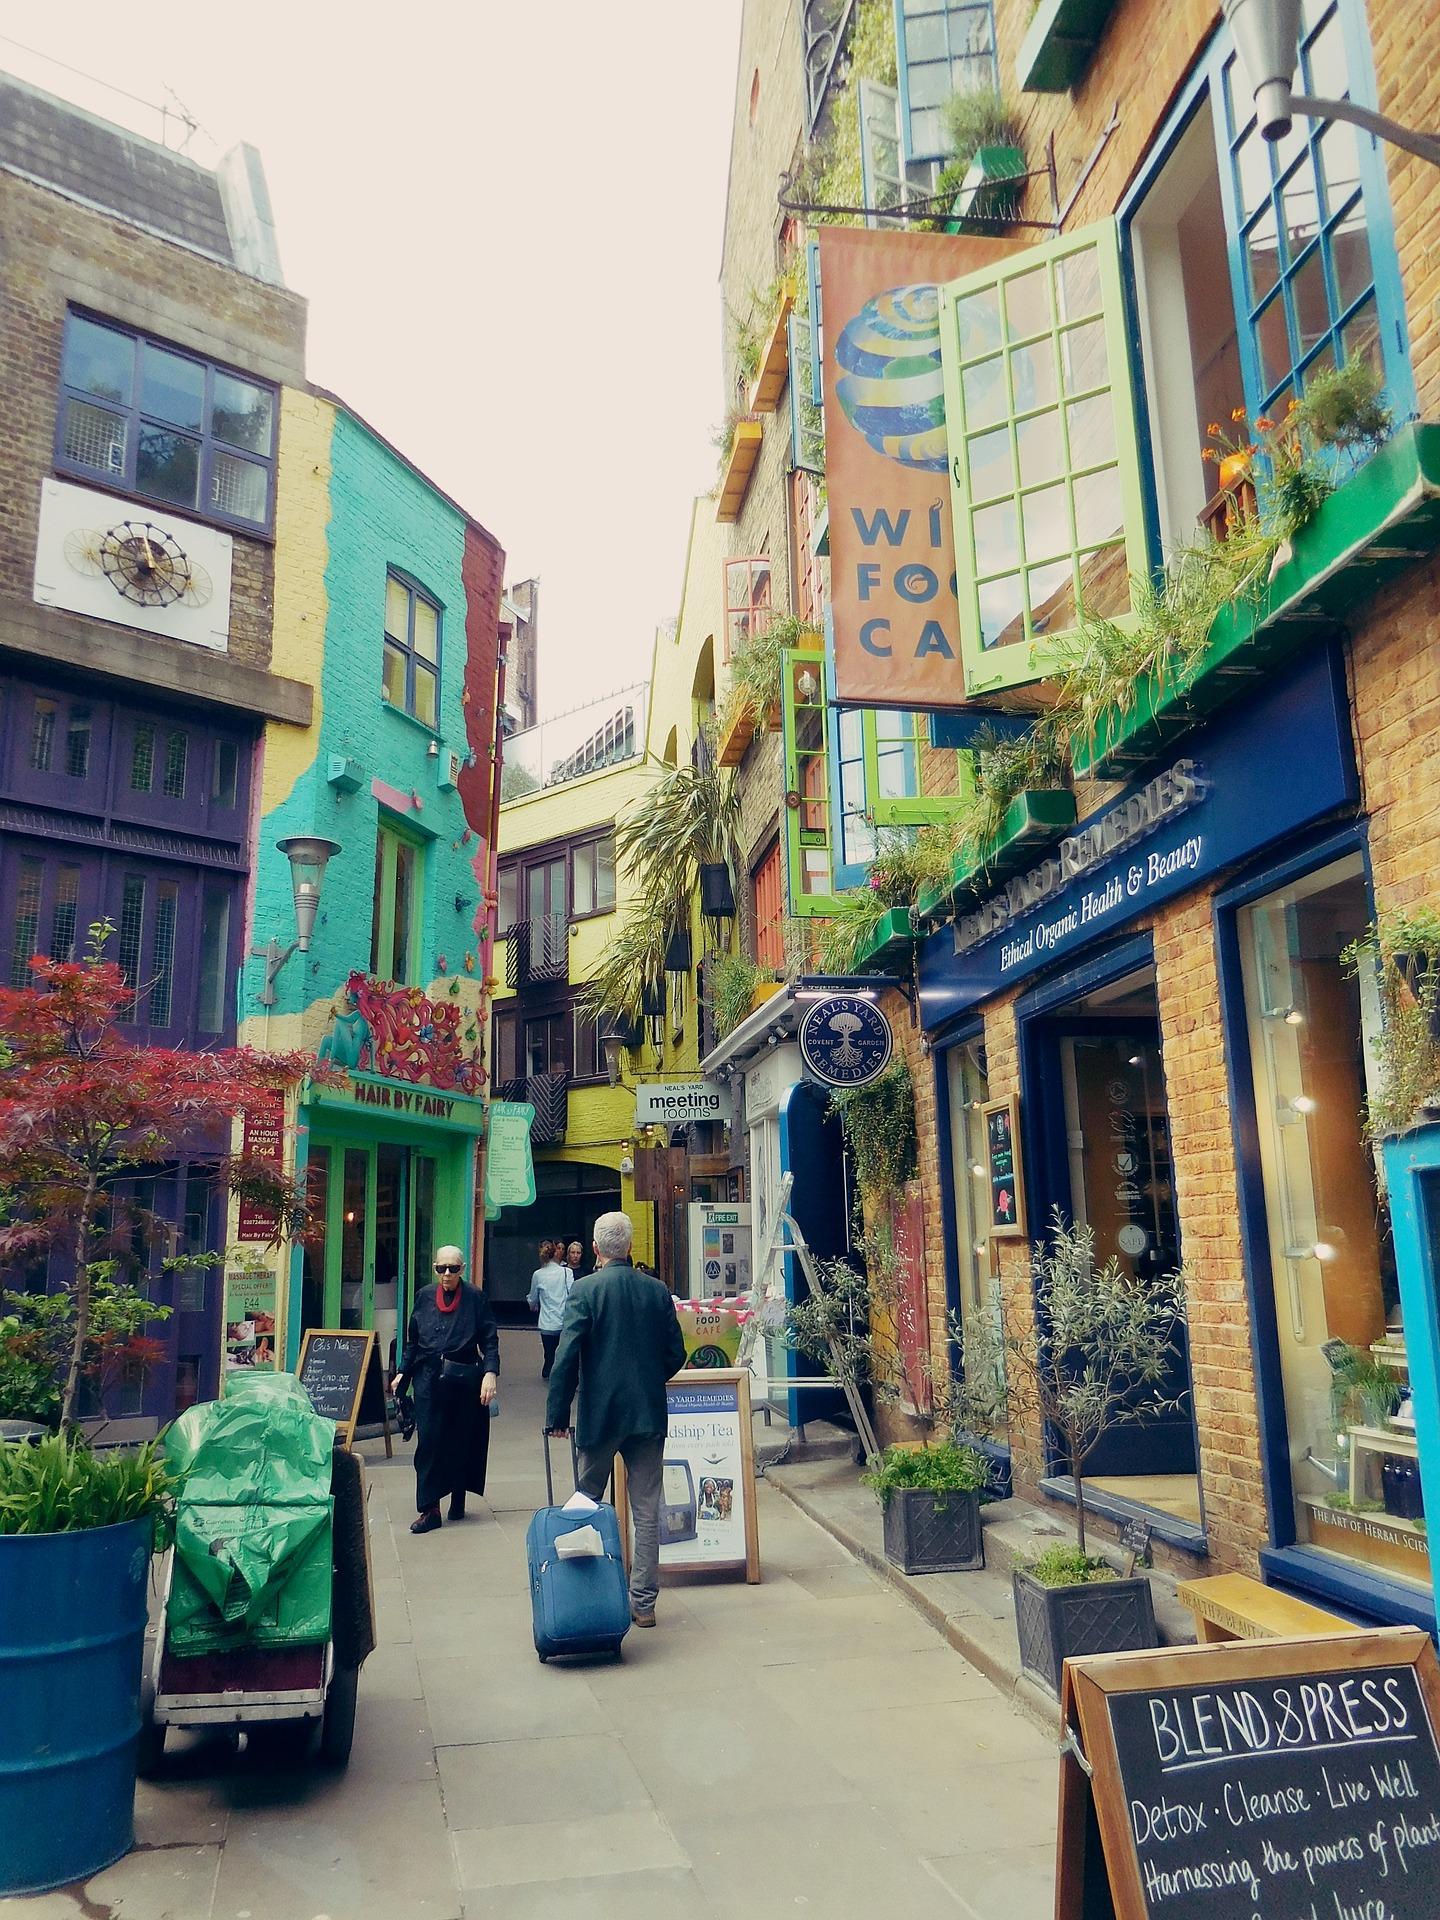 Neal's yard Londen huizen